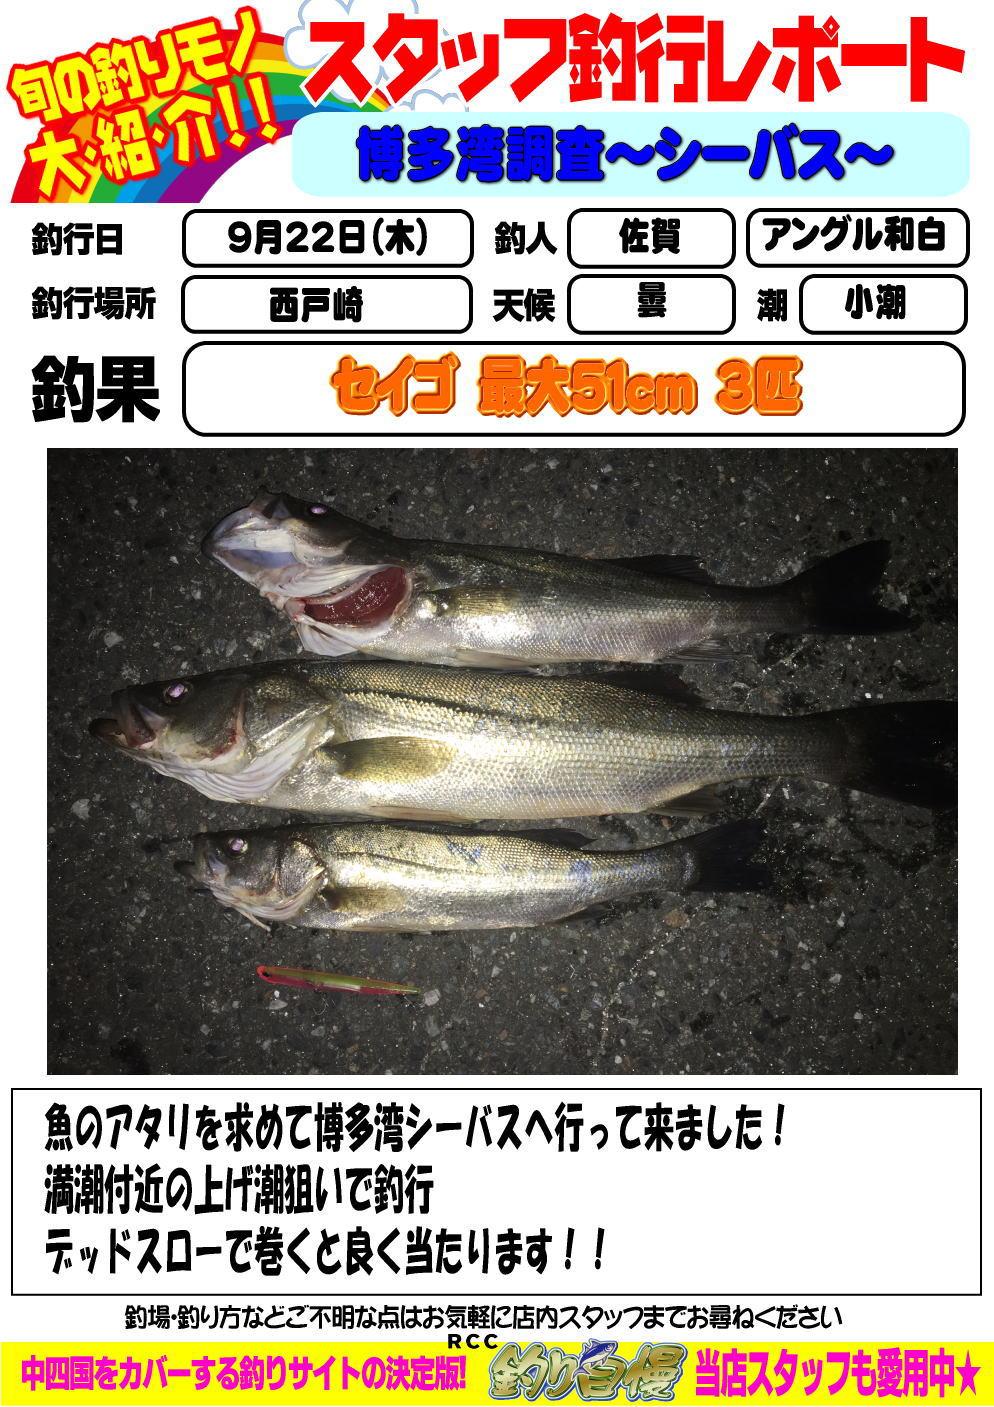 http://www.e-angle.co.jp/shop/blog/image.jpg%E3%82%B7%E3%83%BC%E3%83%90%E3%82%B9.jpg